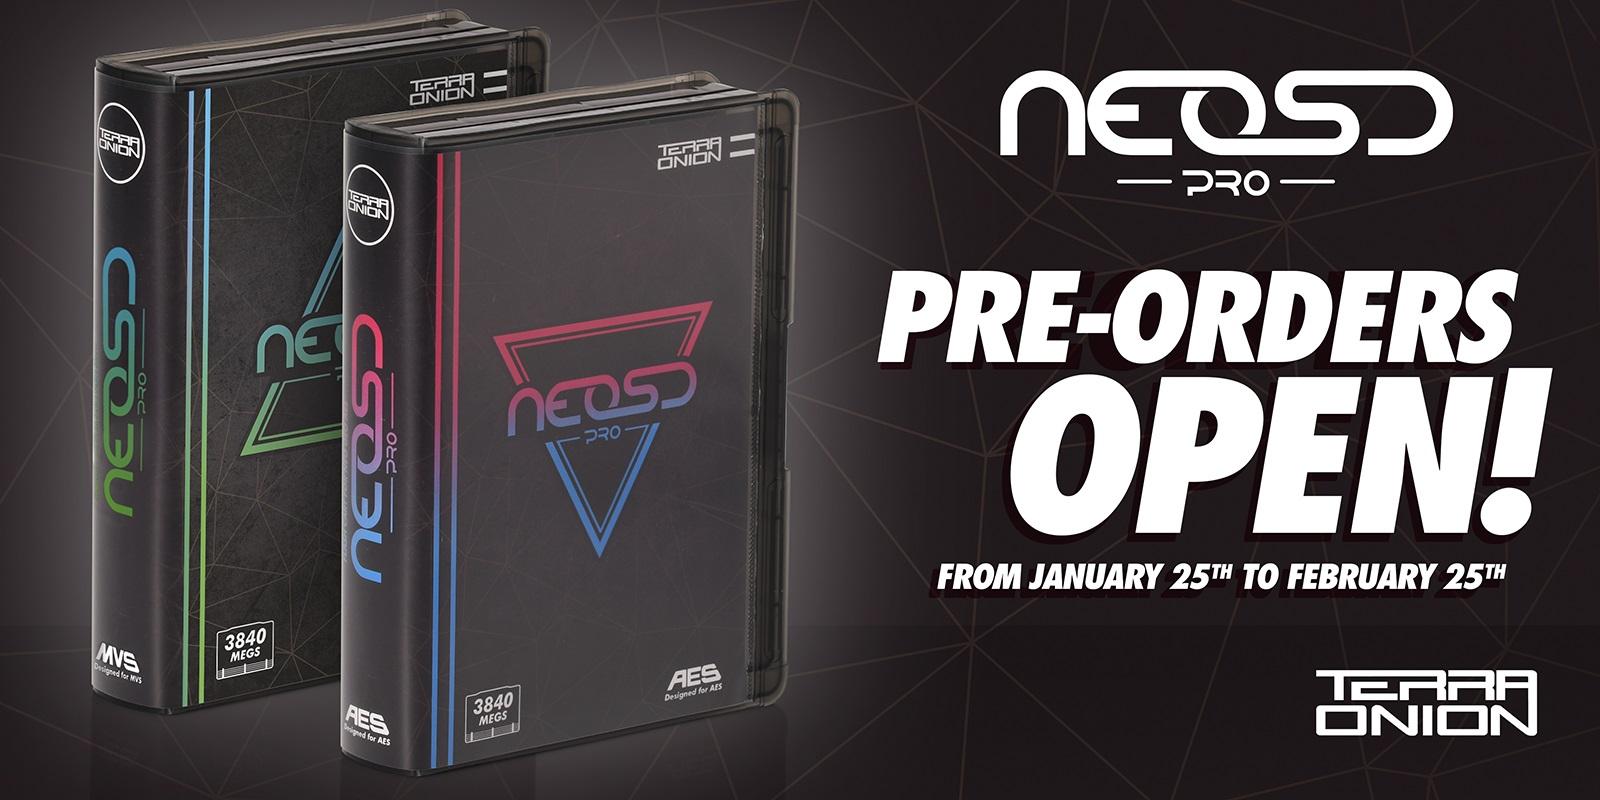 Neo SD Pro AES & MVS Pre-Orders Open